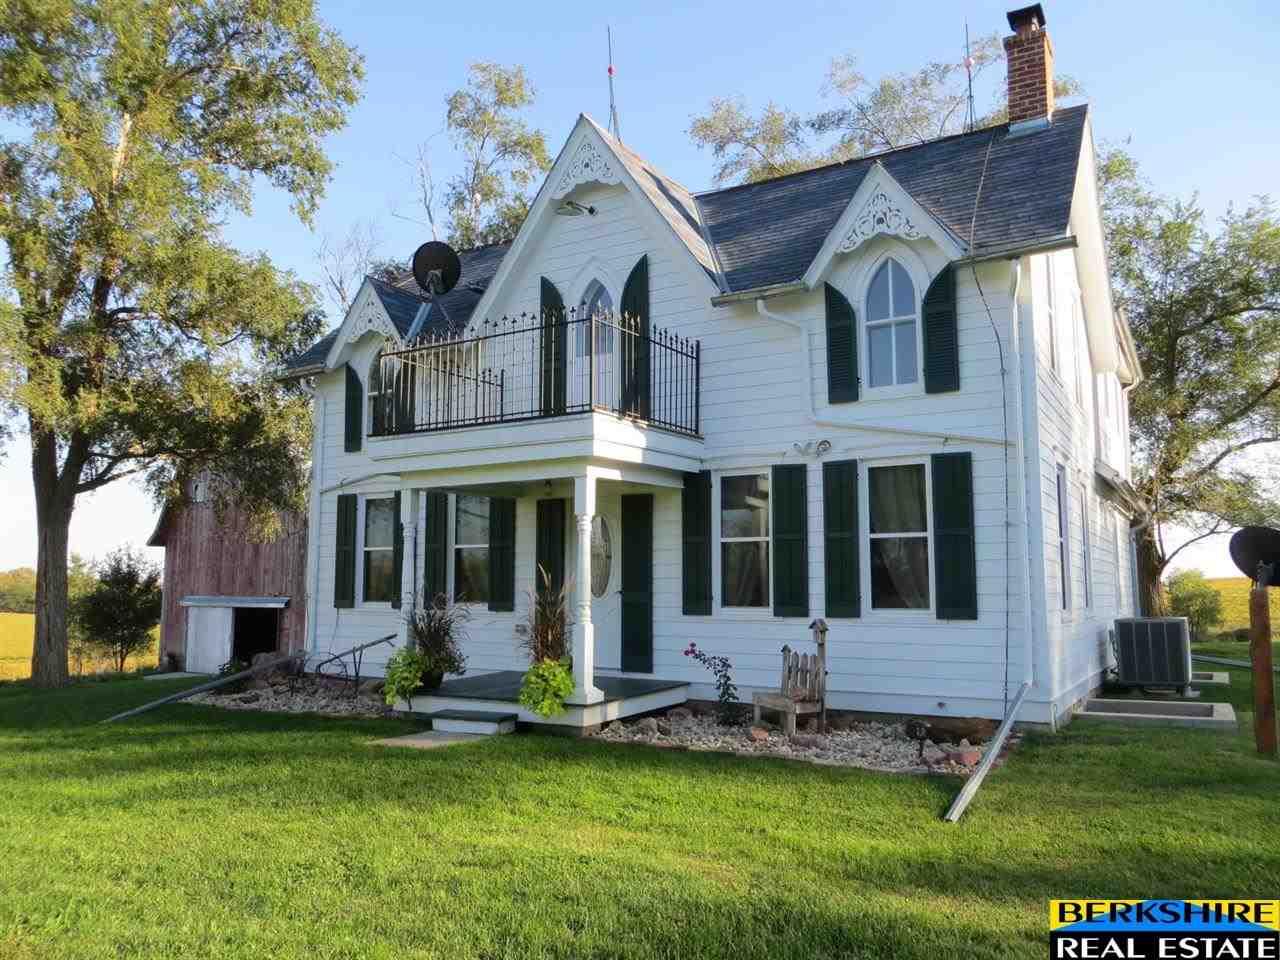 Real Estate for Sale, ListingId: 30080834, Otoe,NE68417